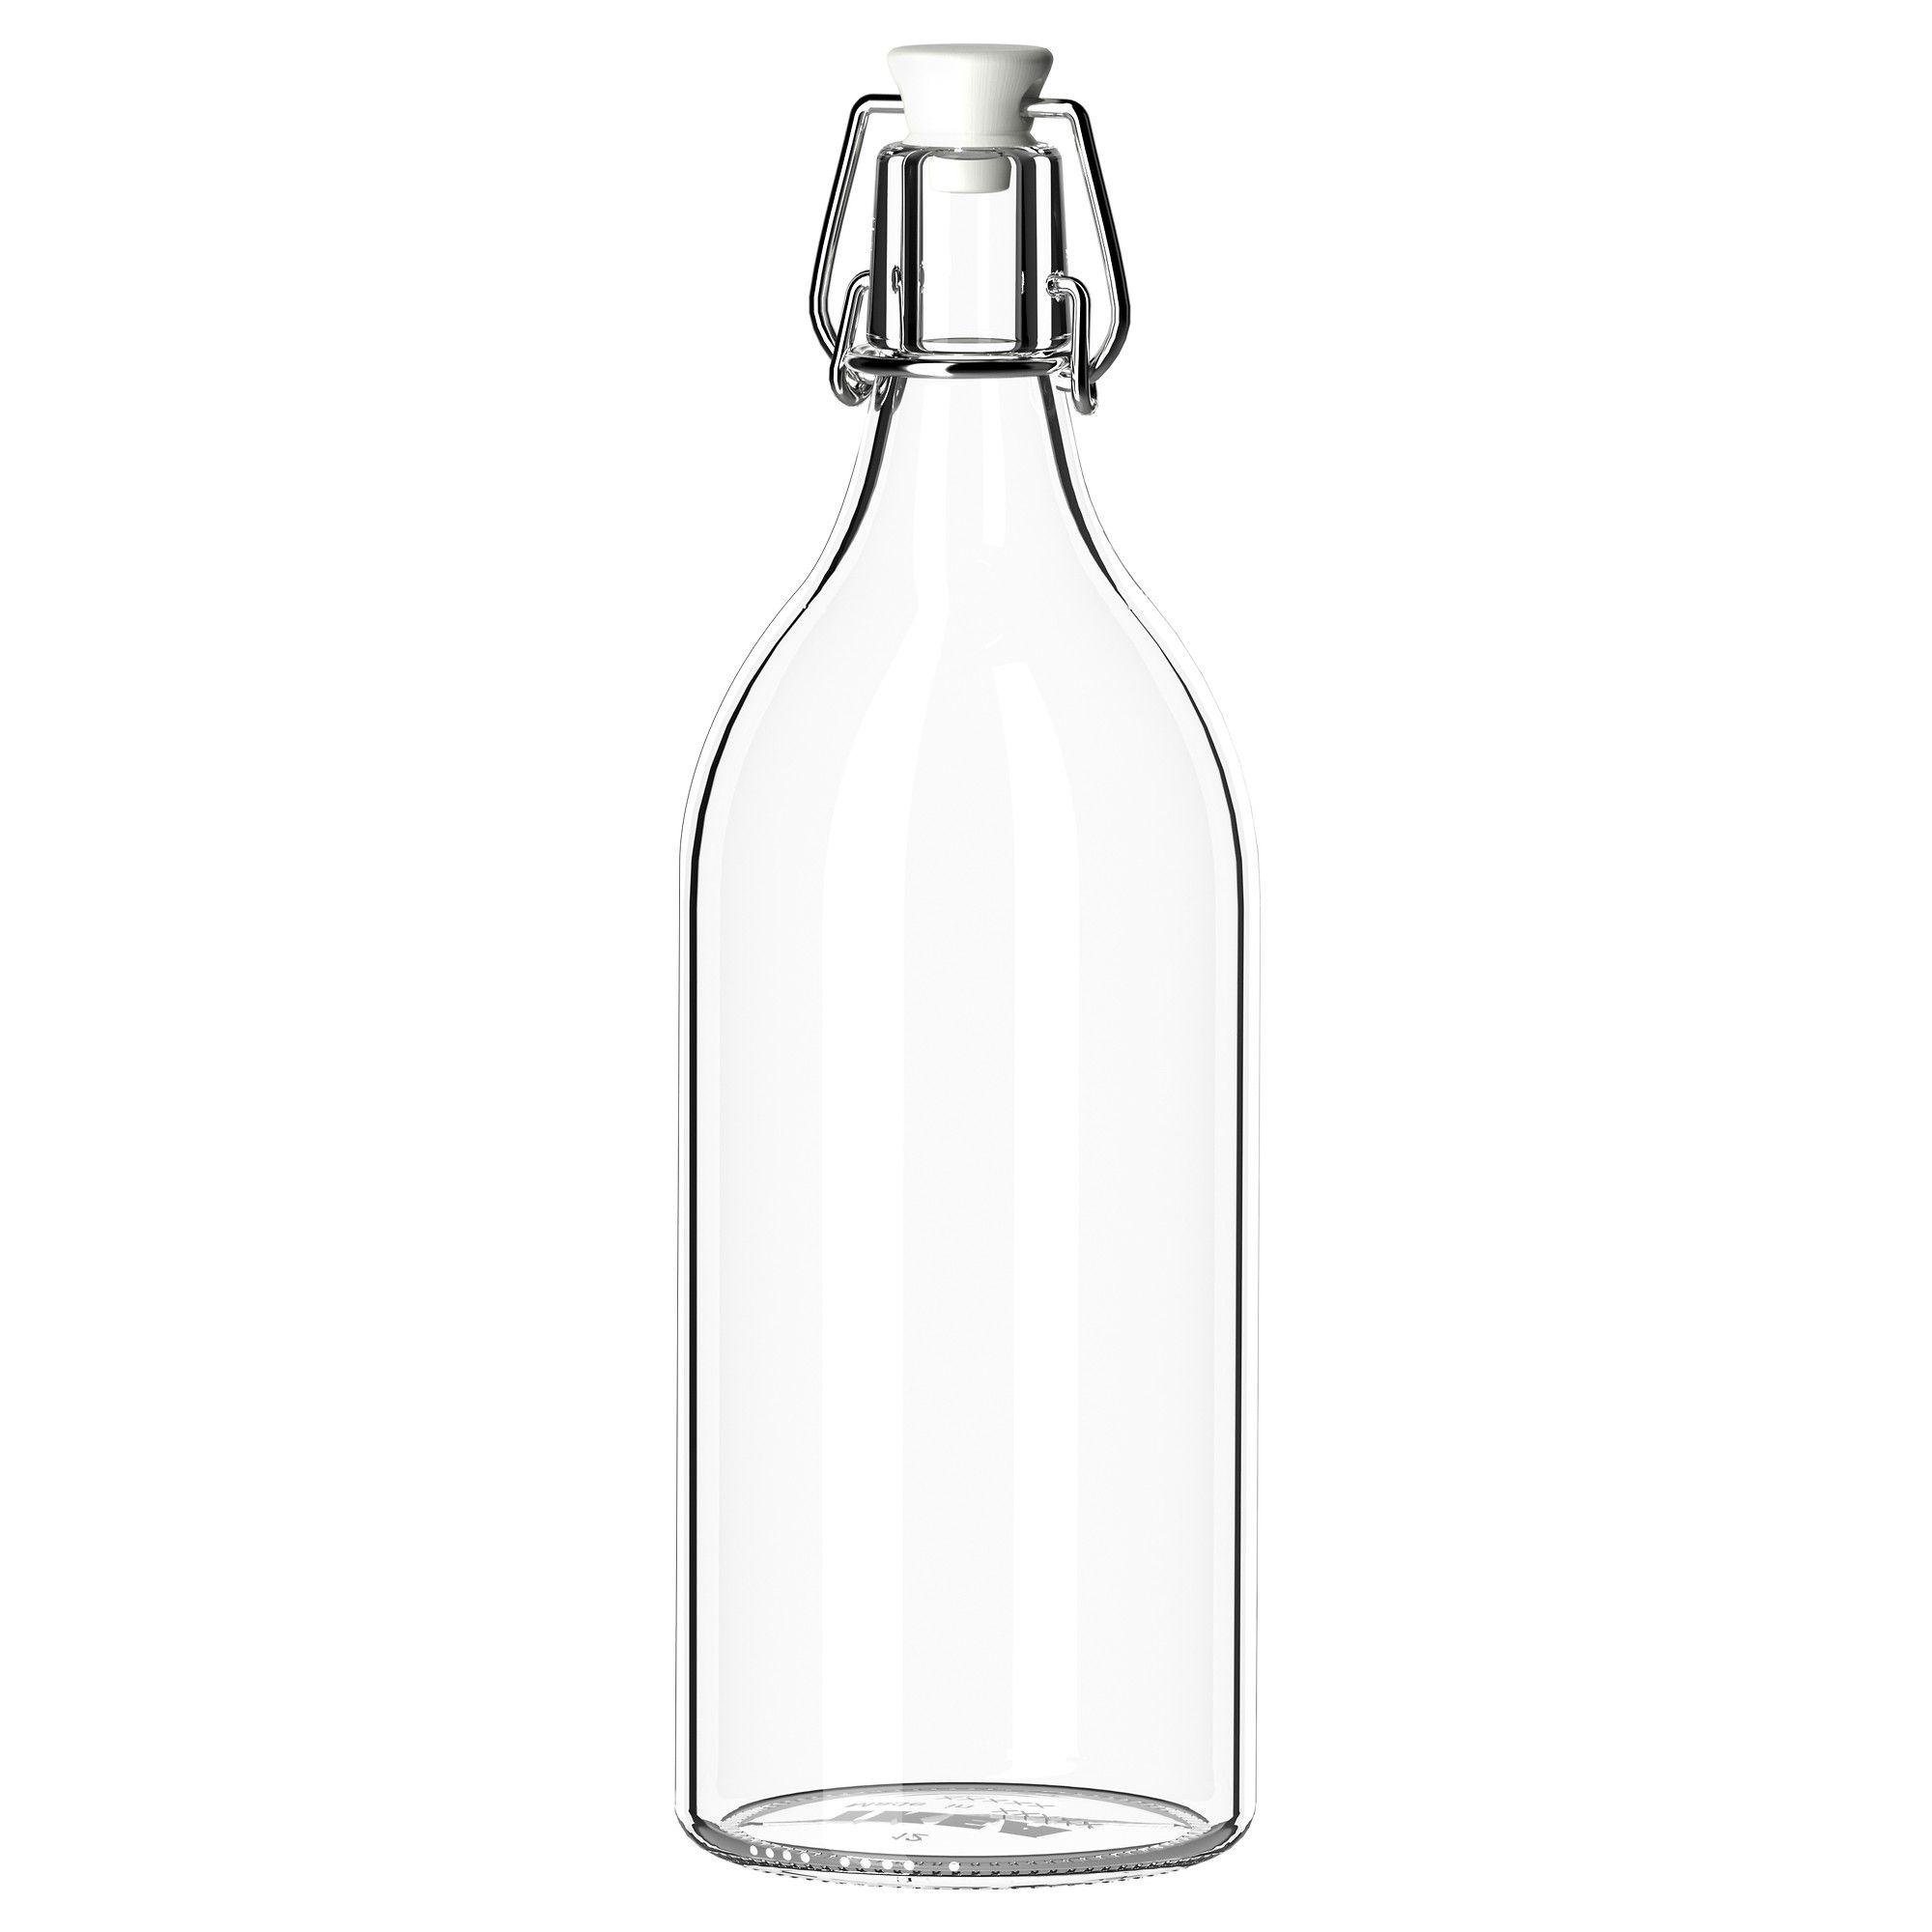 Korken bottle with stopper clear glass bottle kitchens and korken bottle with stopper ikea 399 can anybody say hanging reviewsmspy